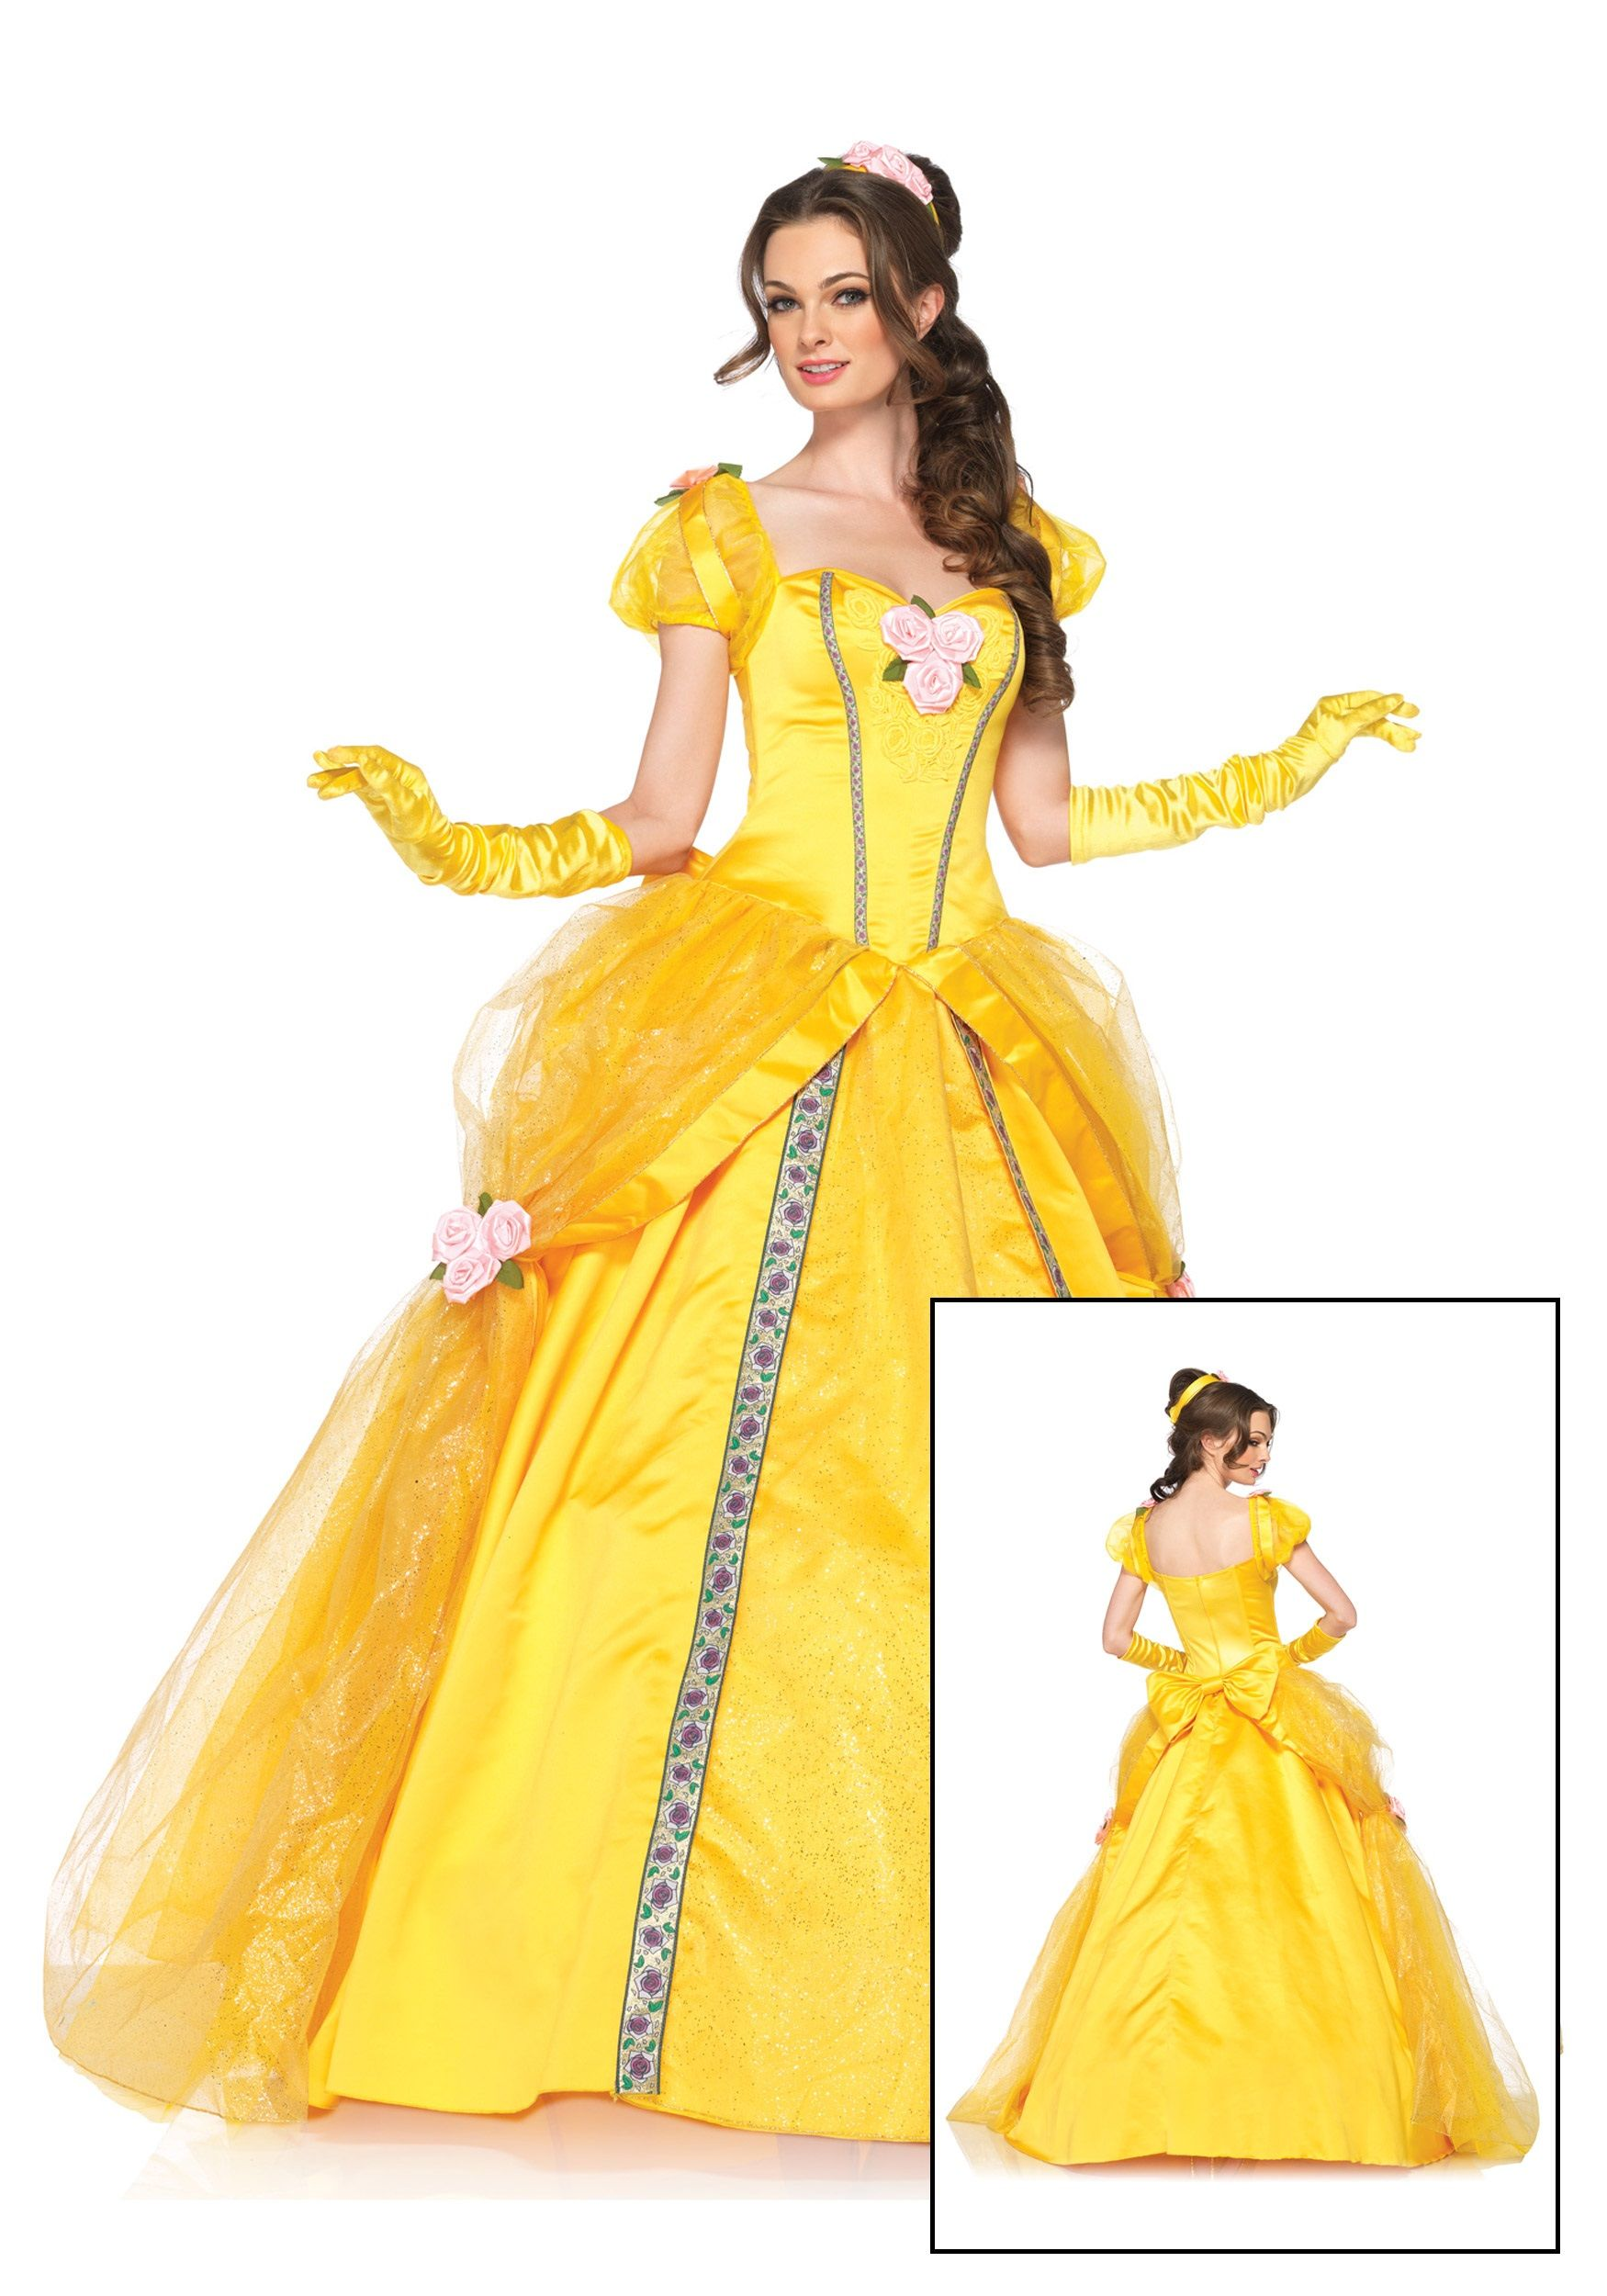 Belle Disney | Womens Disney Deluxe Belle Costume